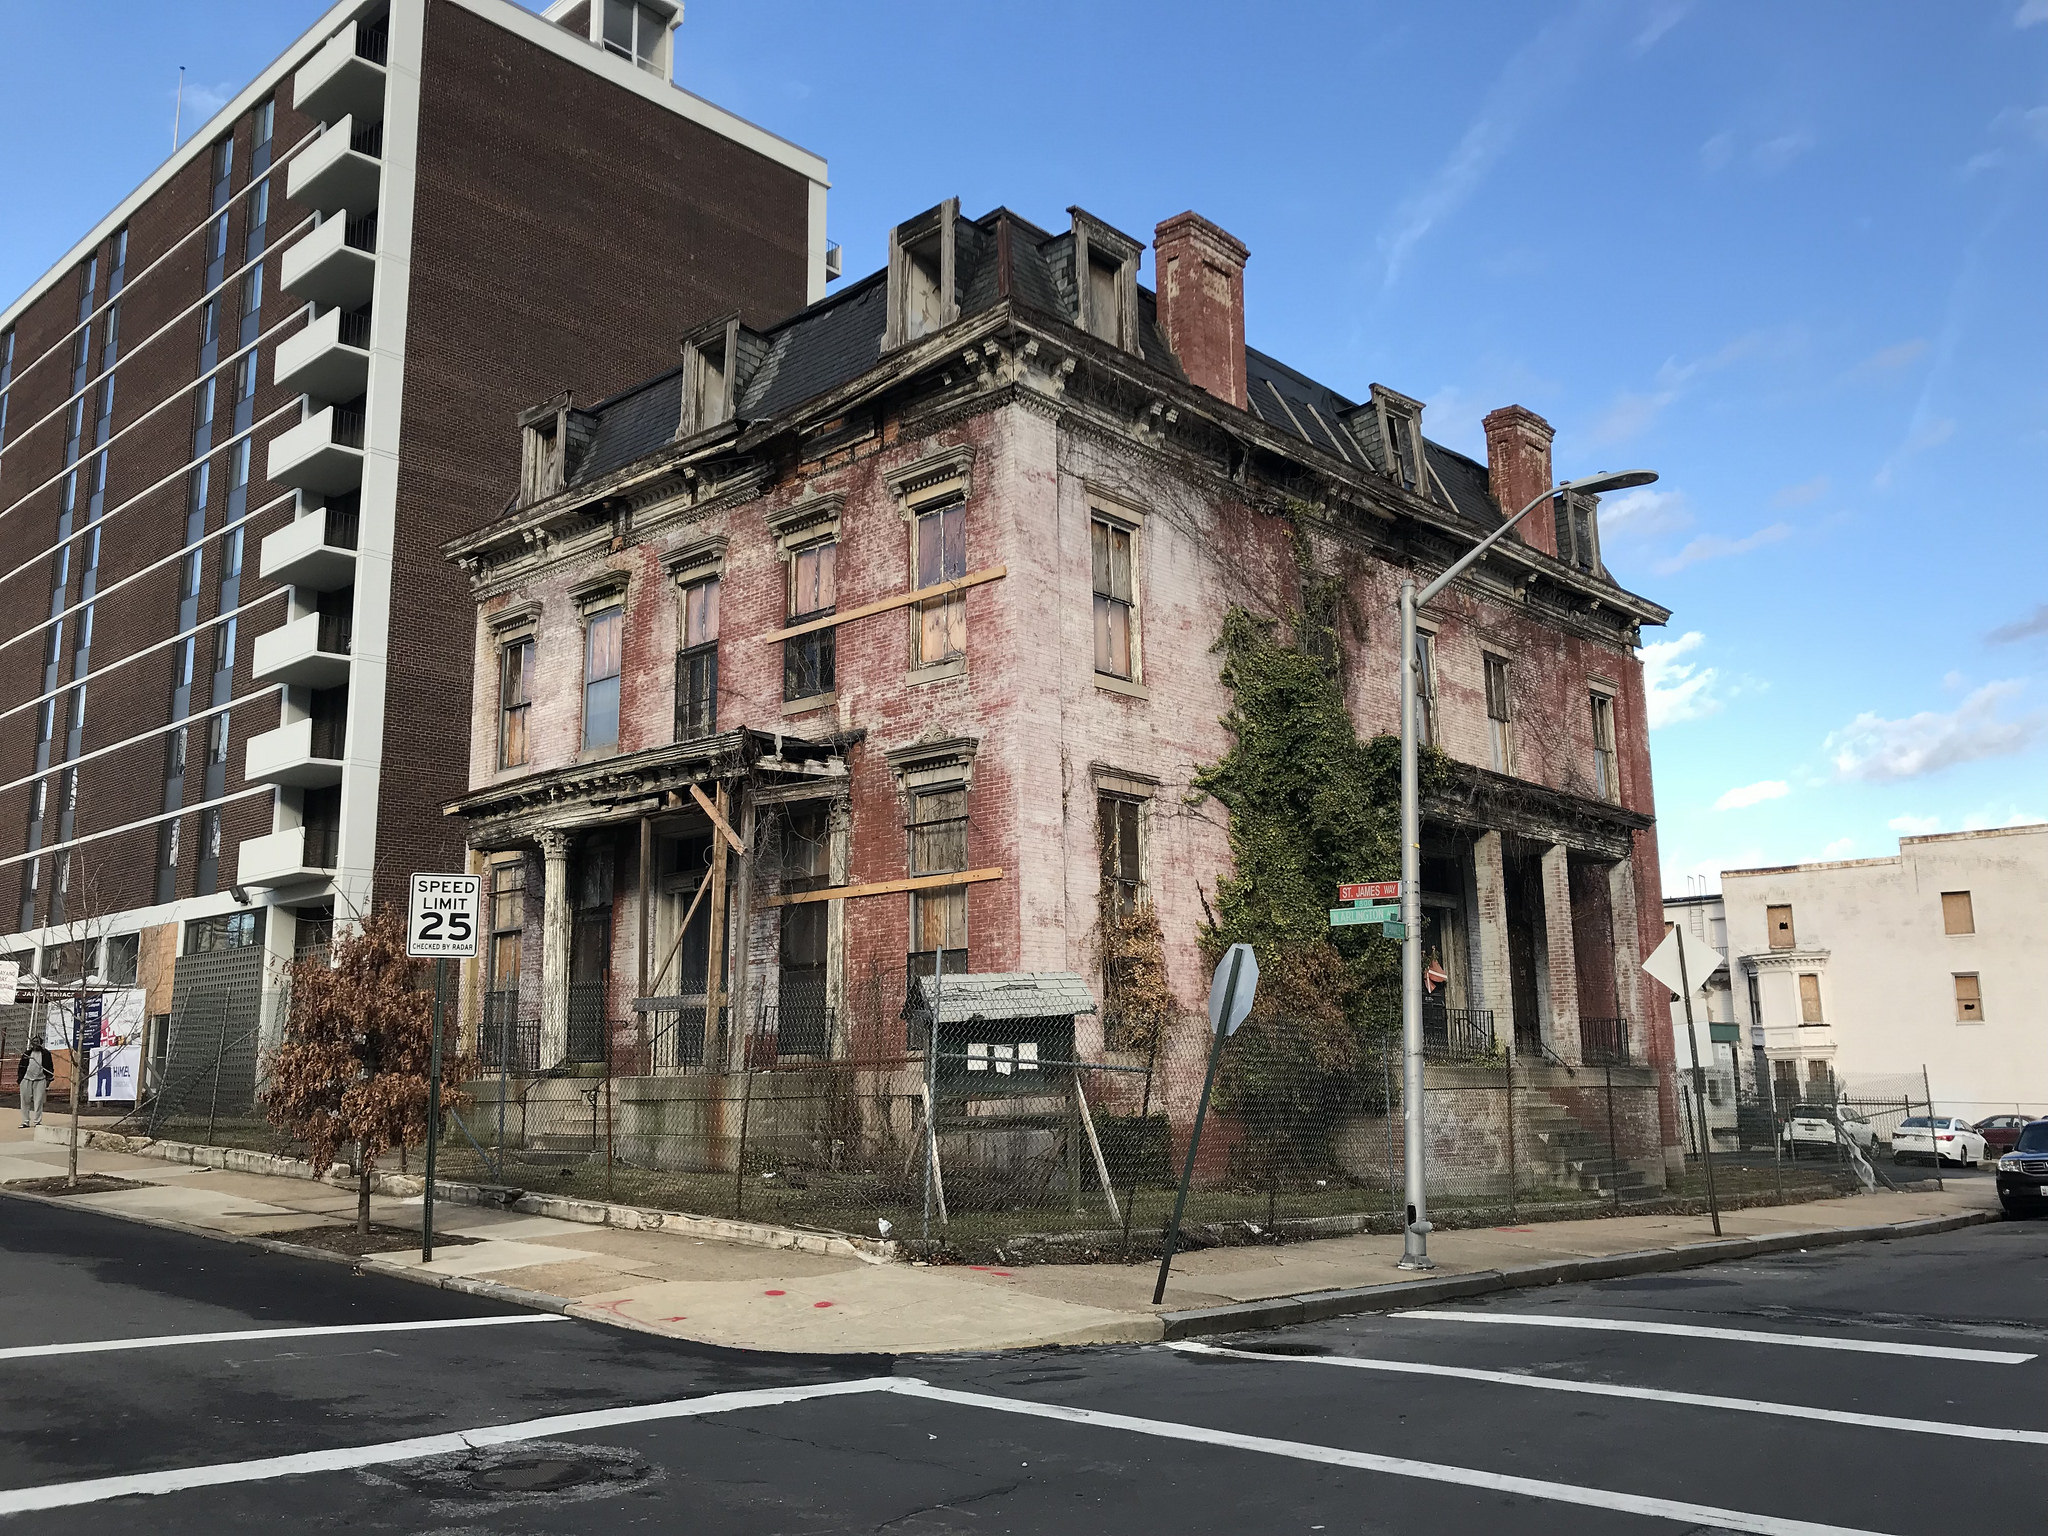 Source: Baltimore Heritage via  Flickr .